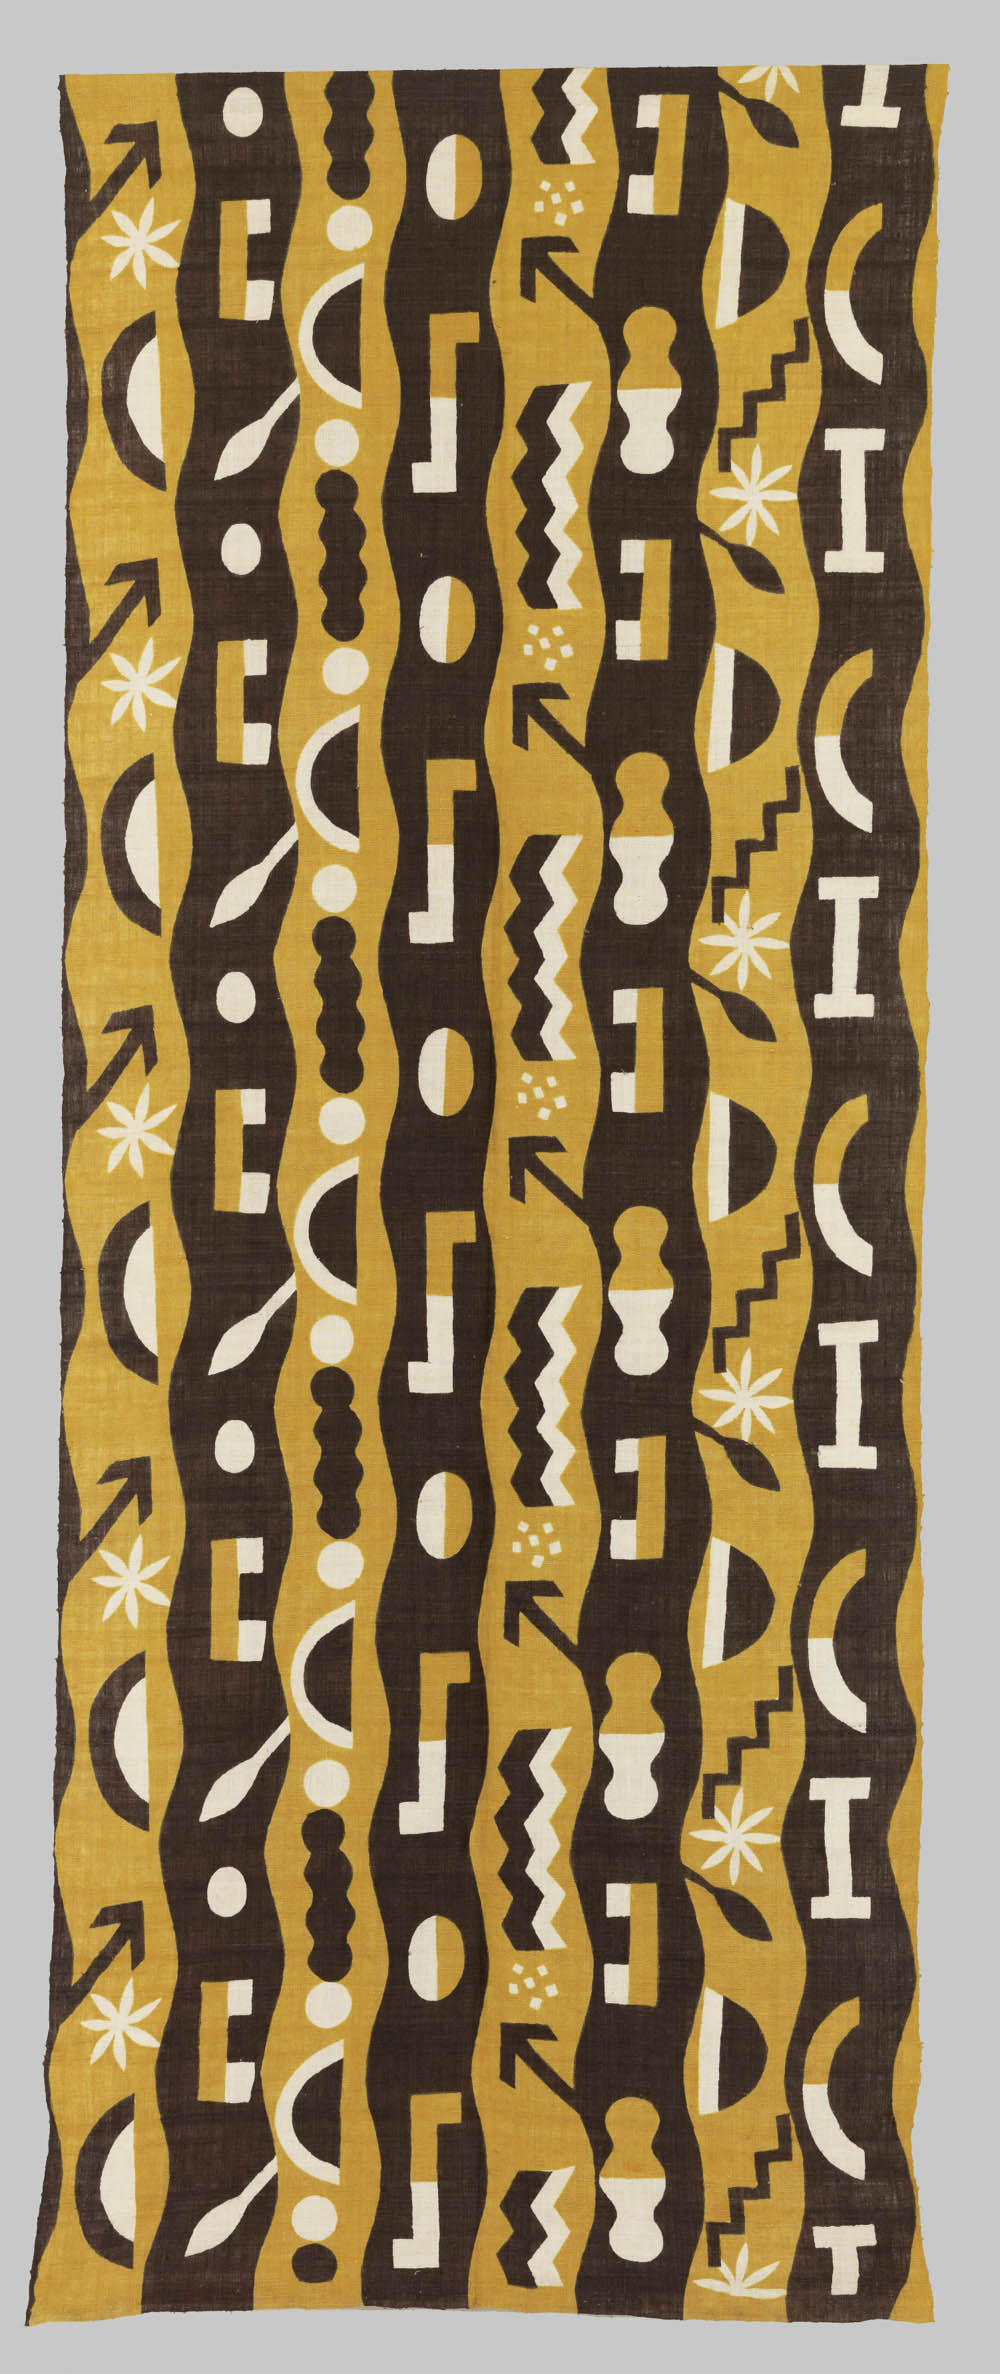 'In search of young shoots', 2002, Silk, 306 x 122 cm, Don Samirō Yunoki, 2013 - MA 12582, © Paris, RMN - Grand Palais (Musée Guimet, Paris) / Thierry Ollivier